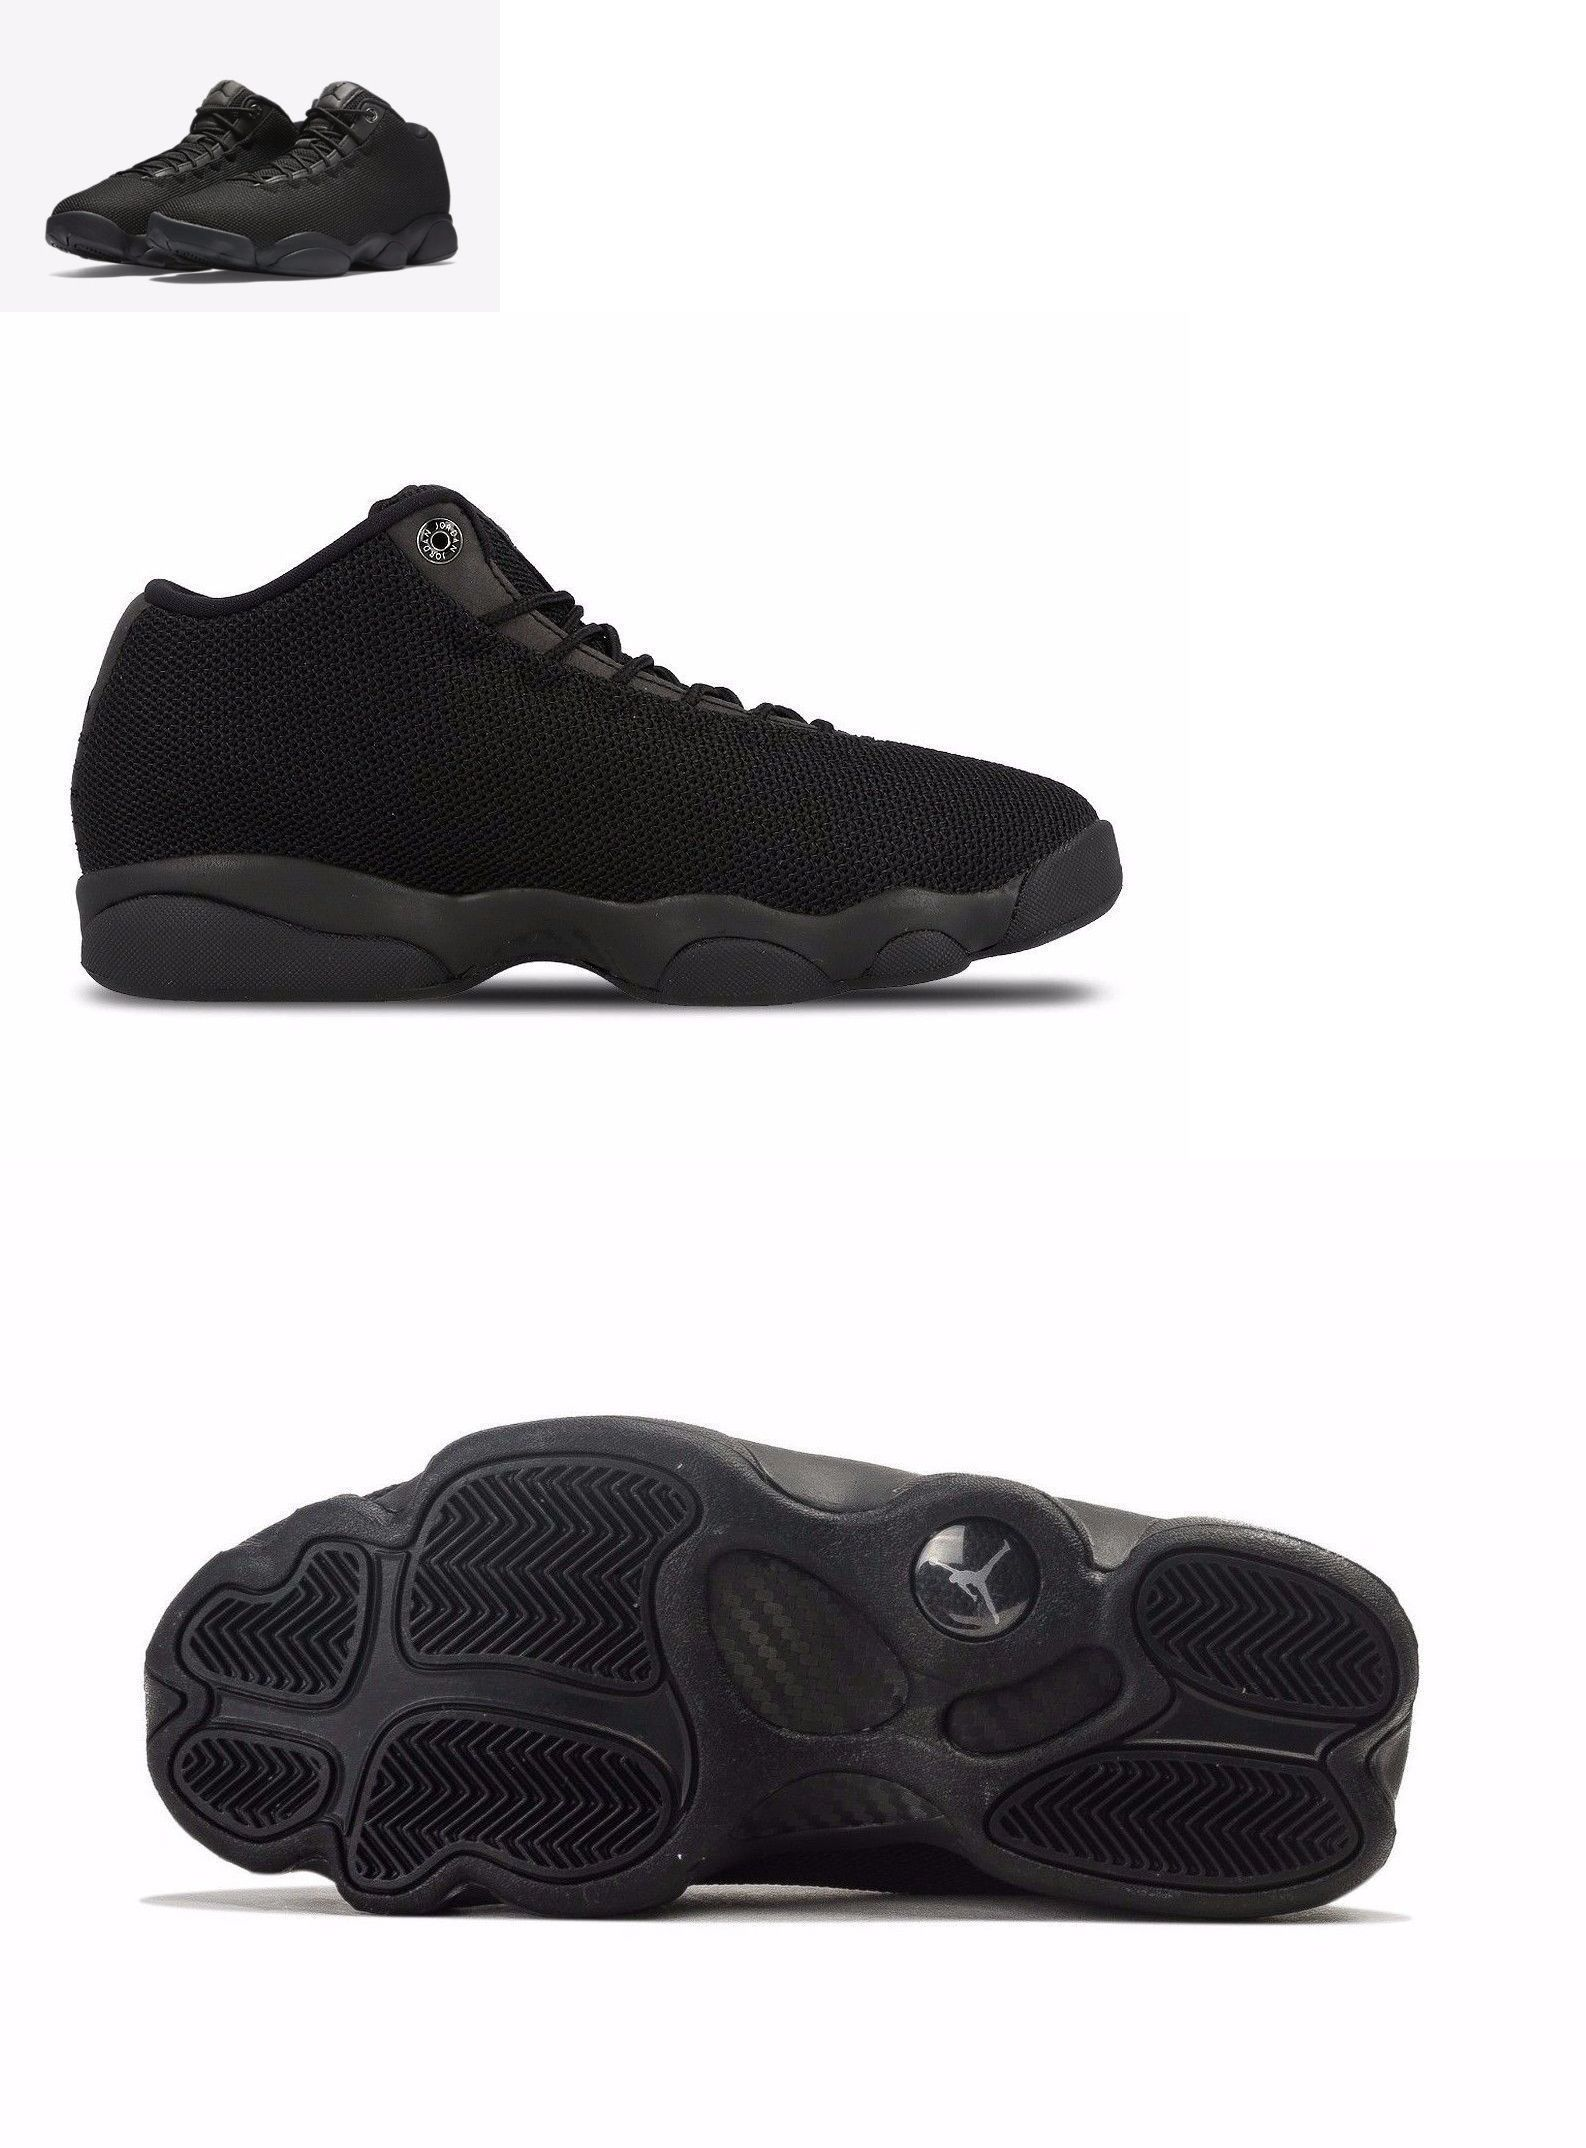 save off d42a1 0cfca ... 006 black white trainers a2407 d6d8a  order athletic 15709 new nike air jordan  horizon low men s basketball shoes black 845098 010